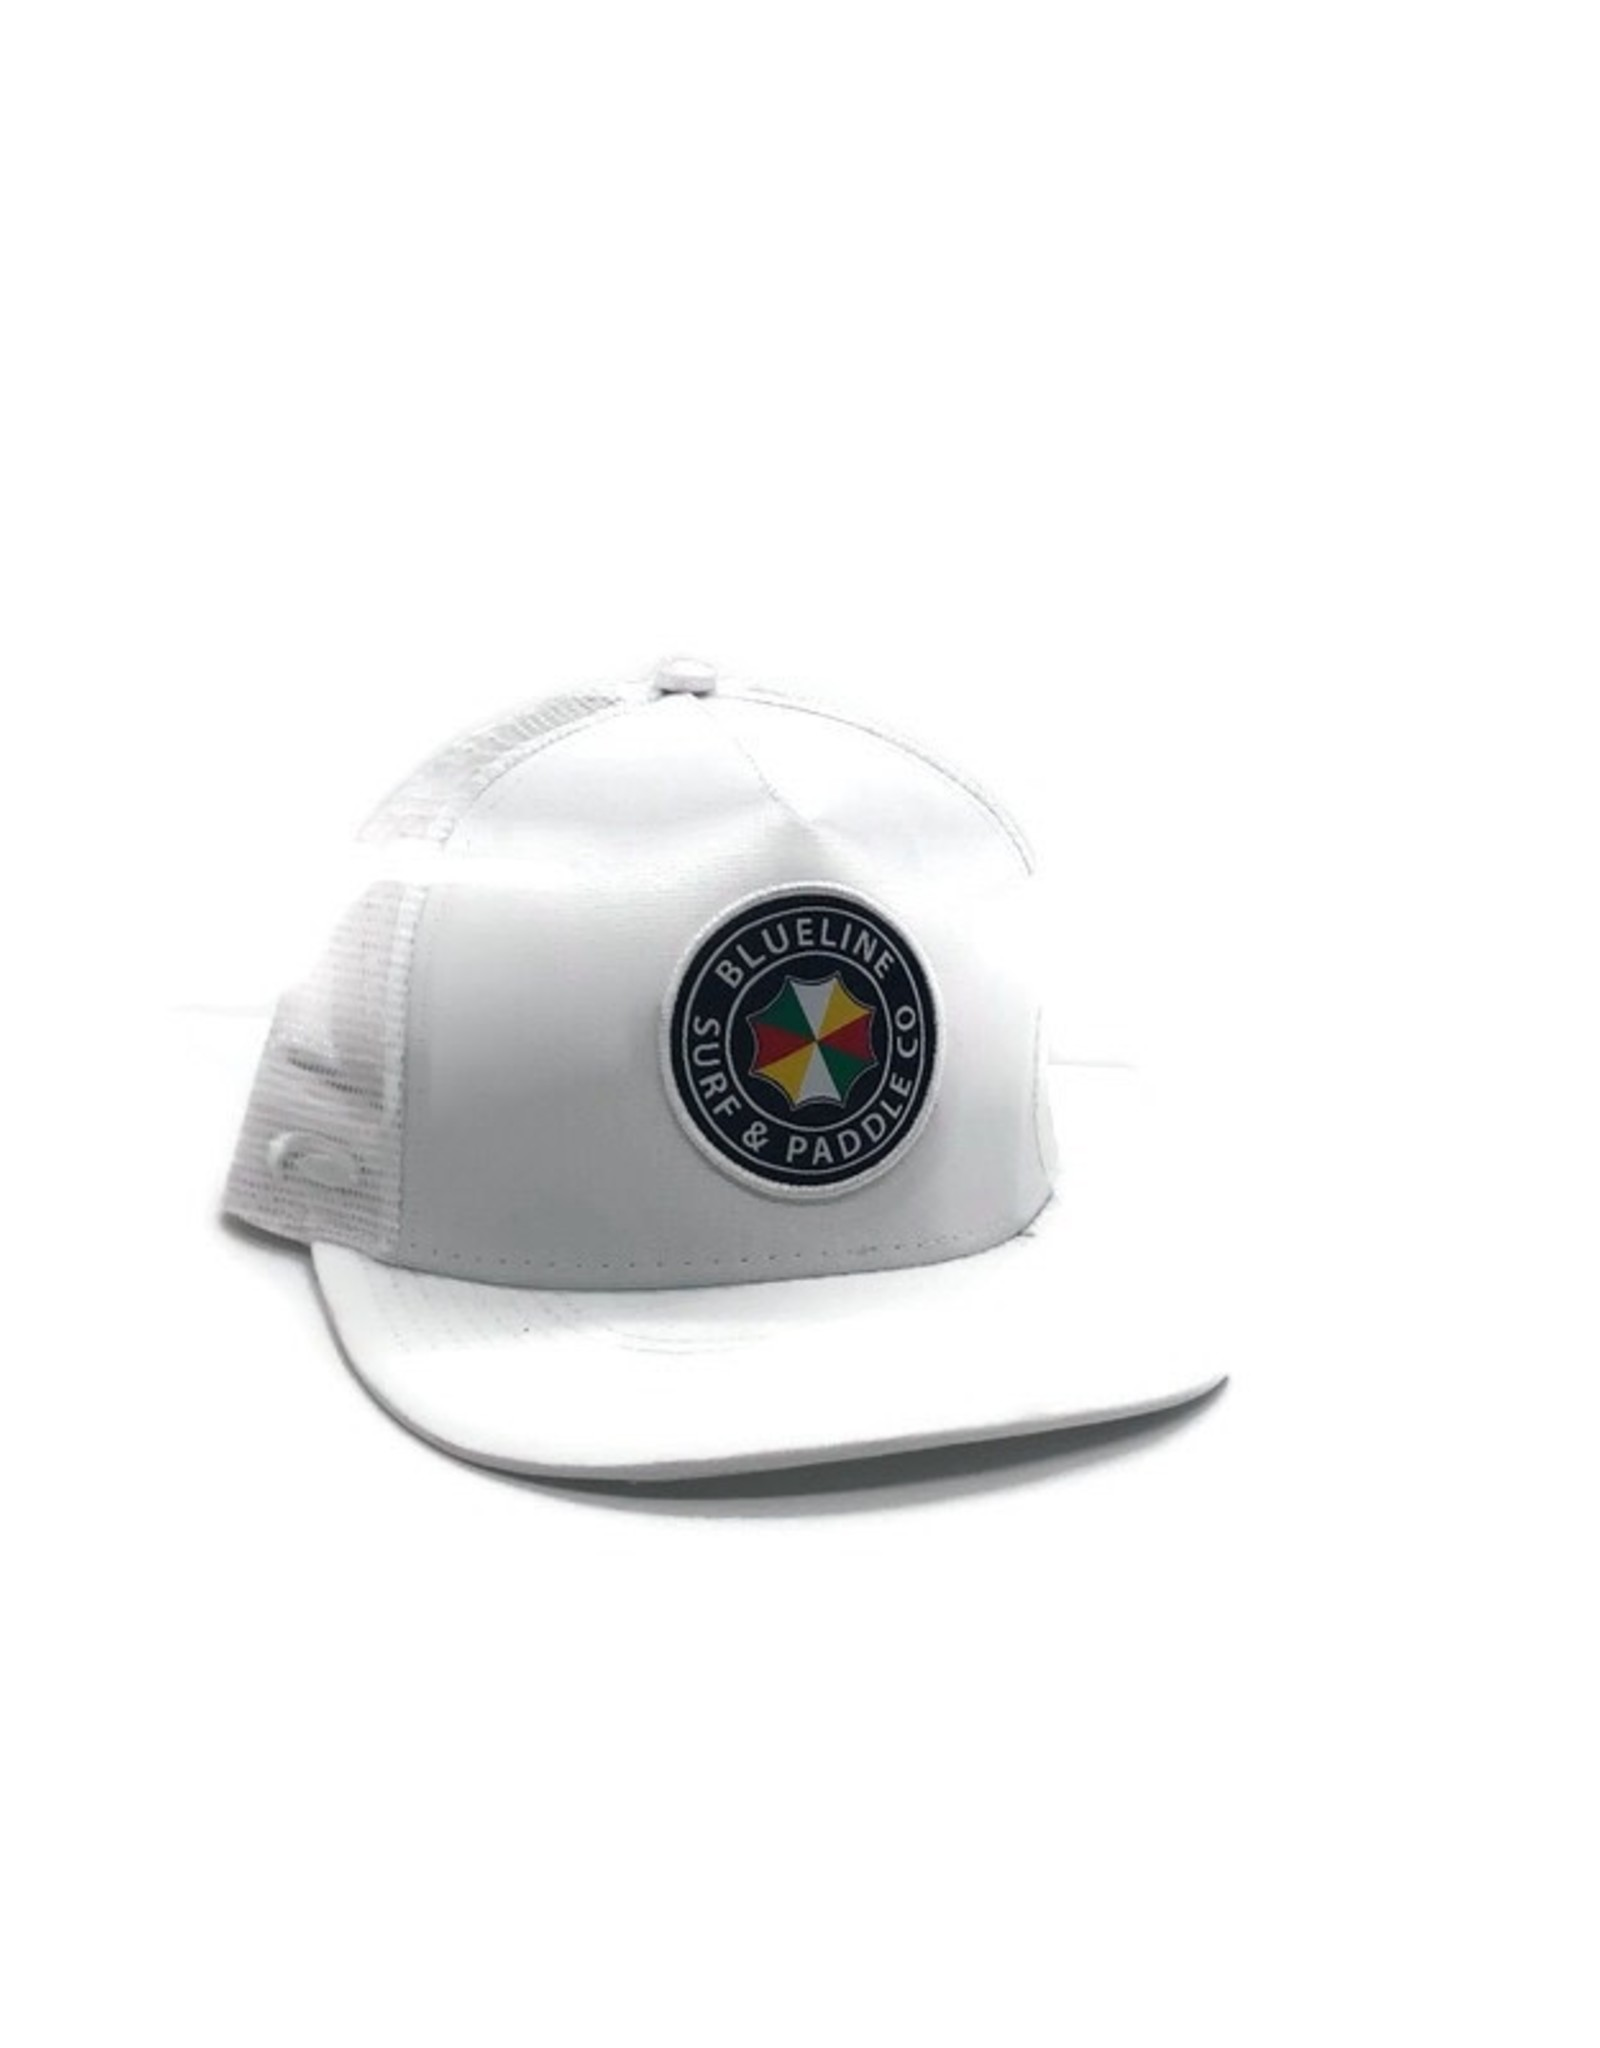 Blueline Surf + Paddle Co. OG Limited Edition Umbrella Performance Hat WHITE